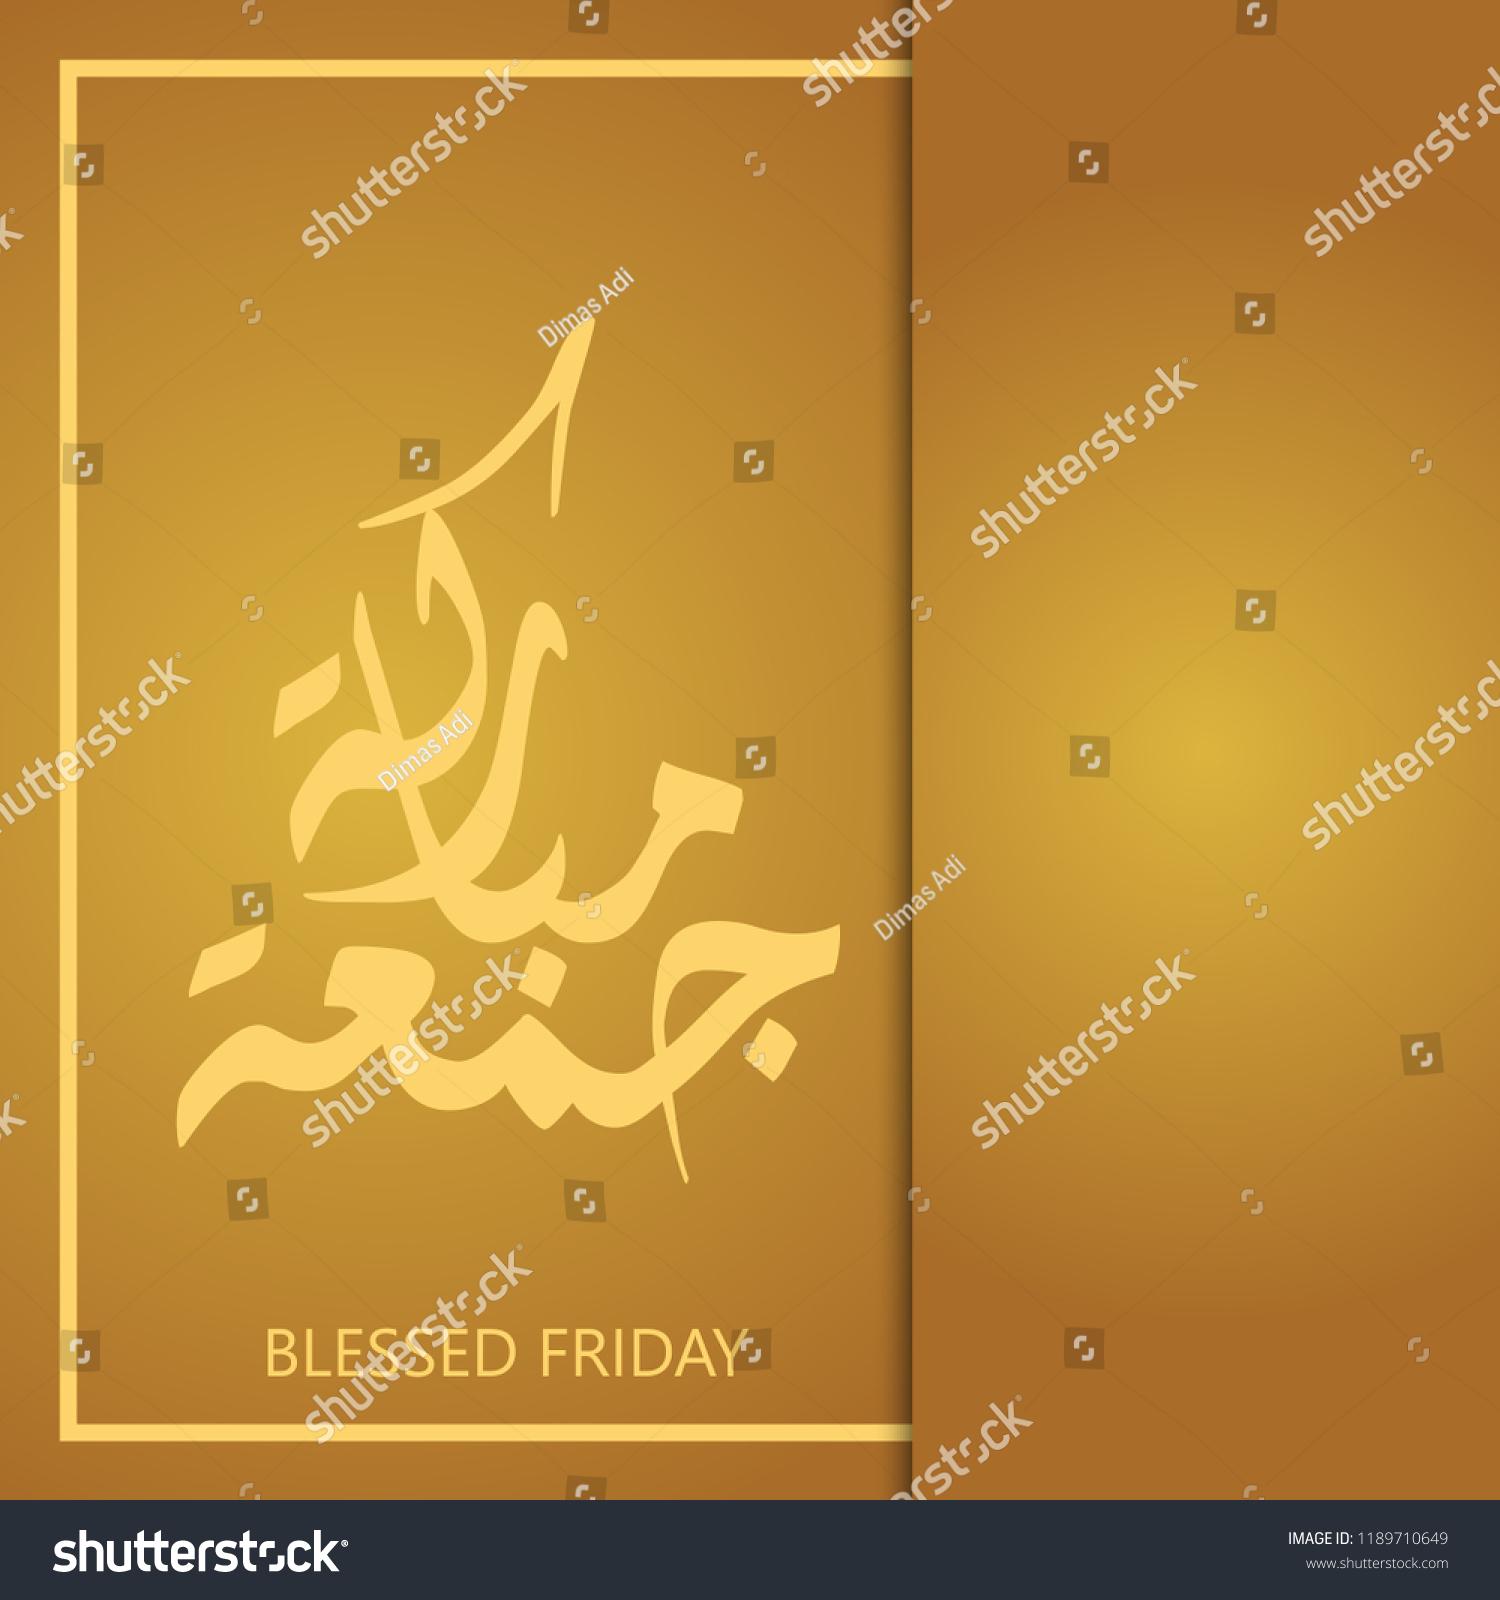 Jumma Mubarak Greeting Illustration Calligraphy Text Stock Vector